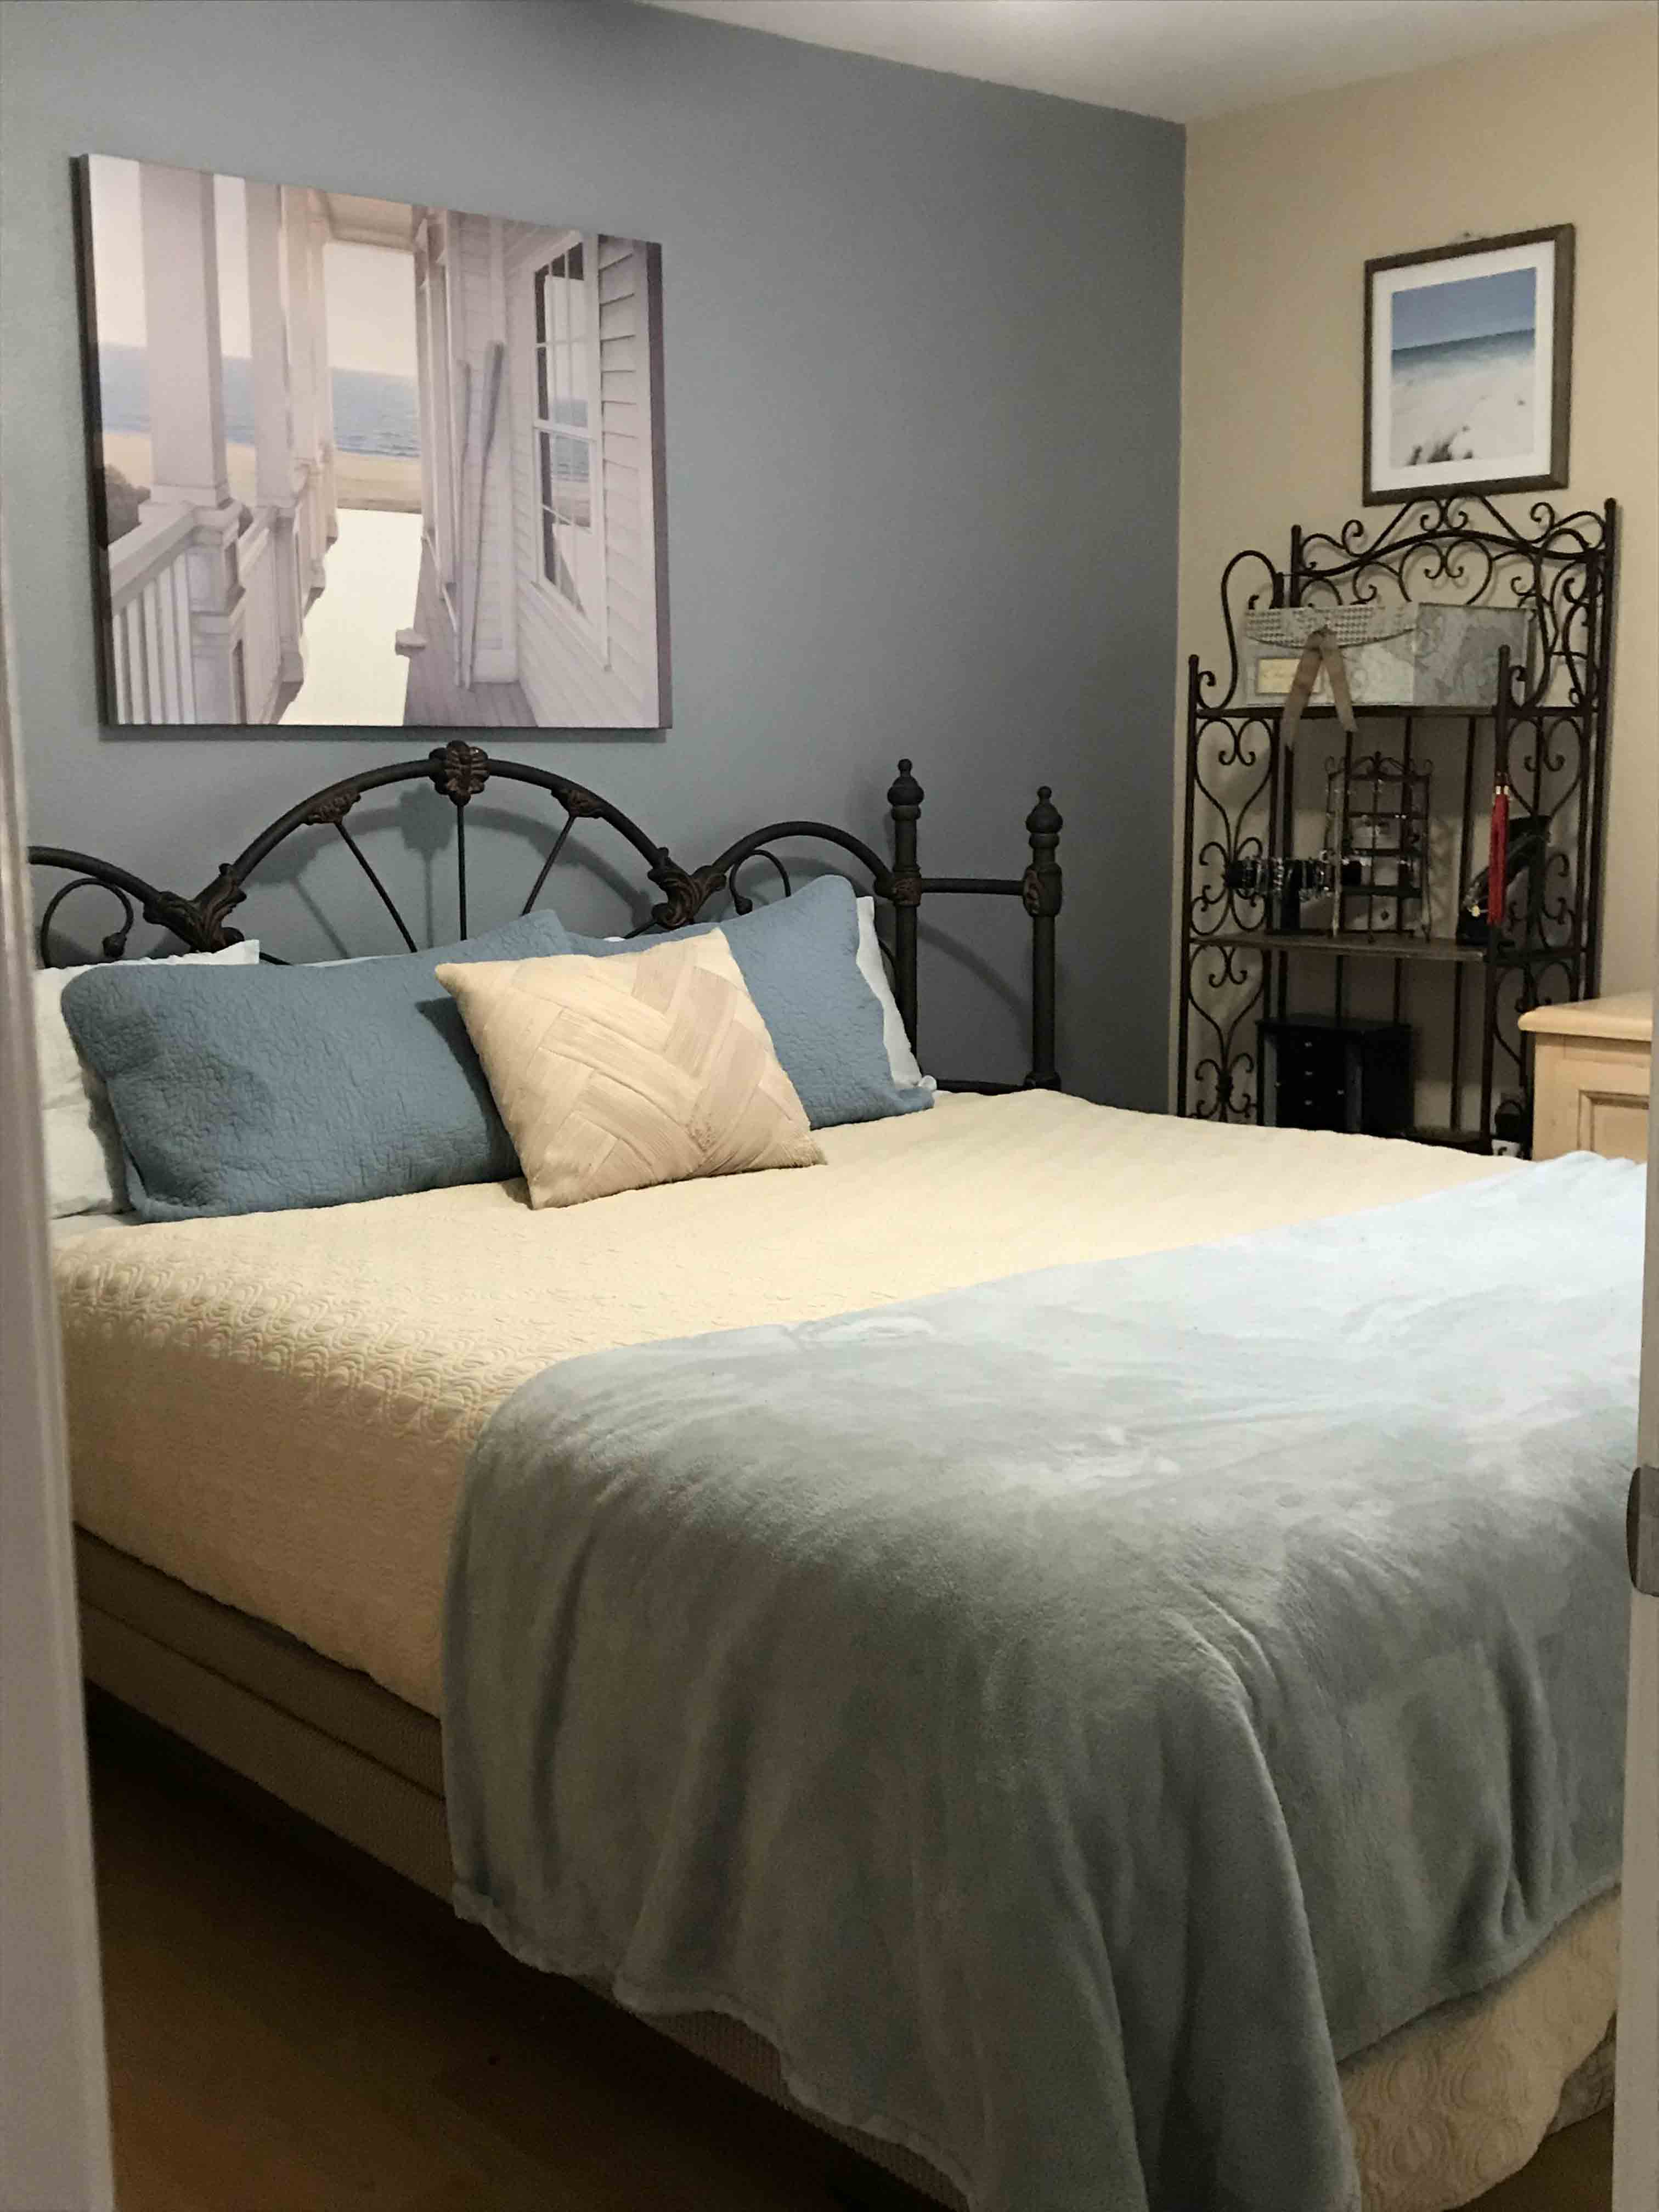 1350 Calle Crisantemo - Bedroom 1